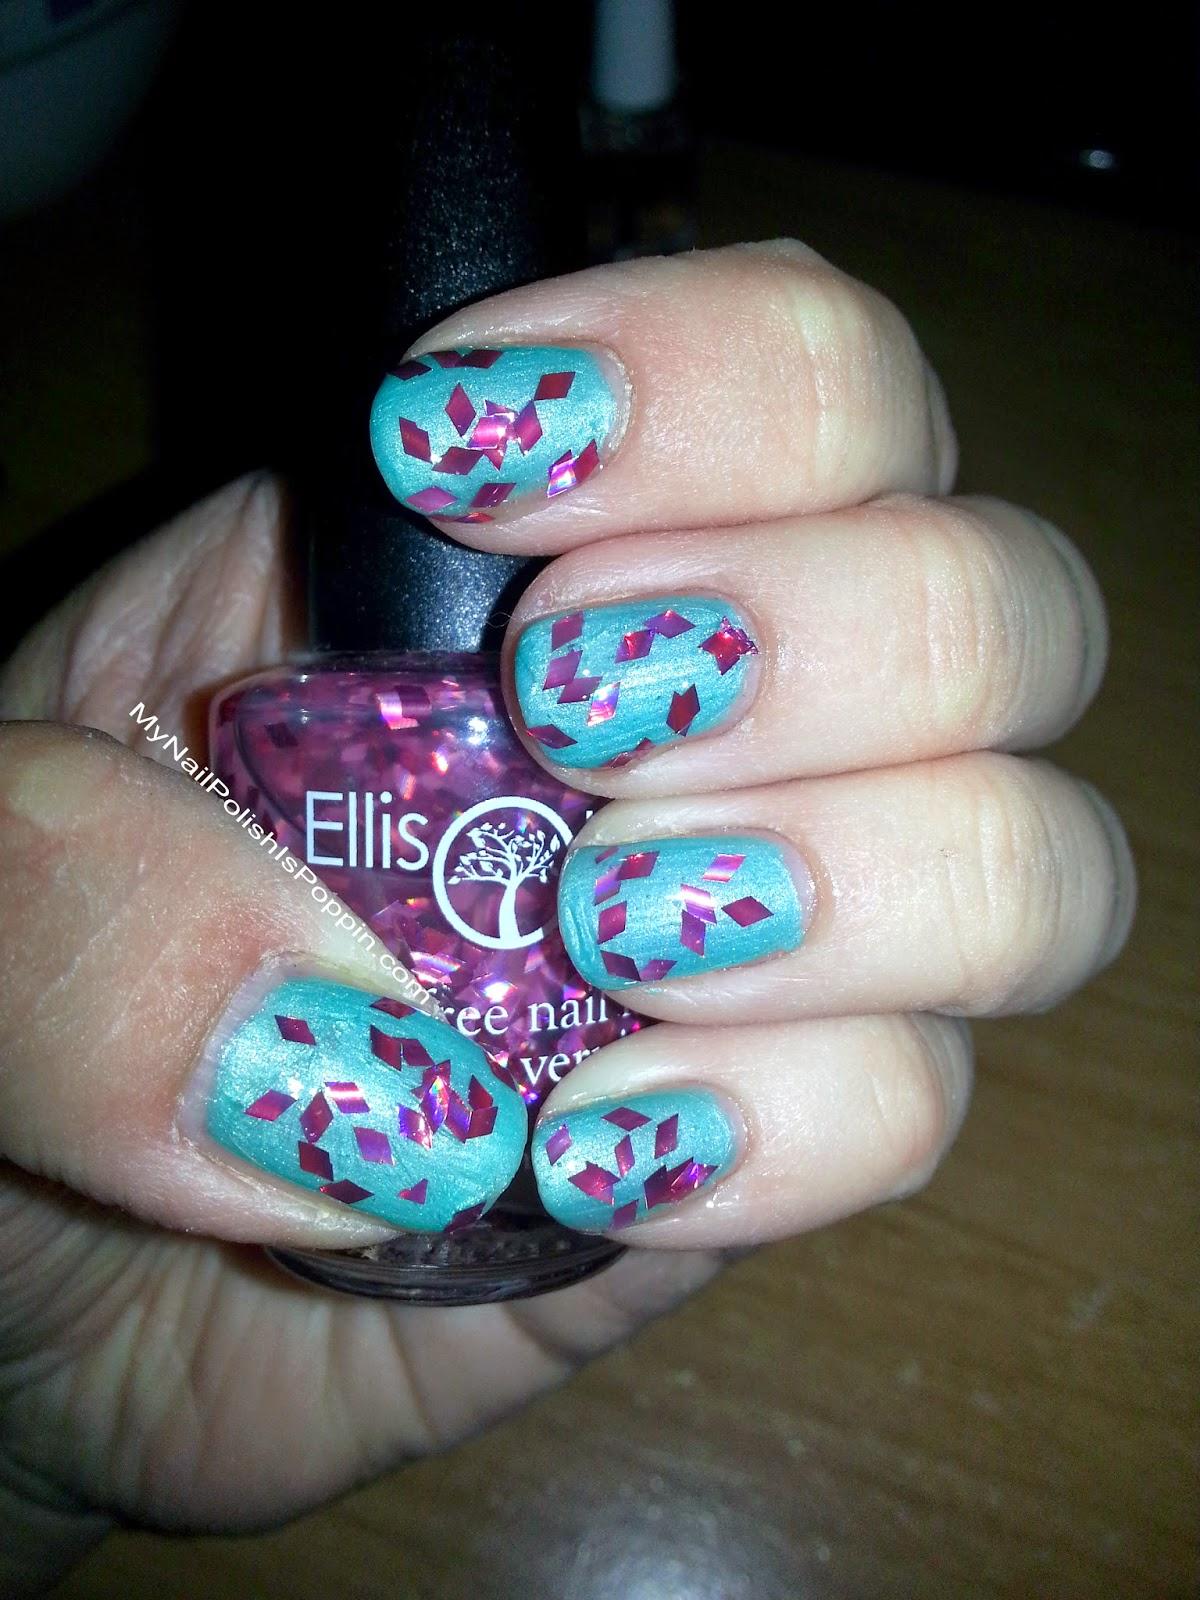 Ellison's Organics Harvey Girl & American Beauty Berry